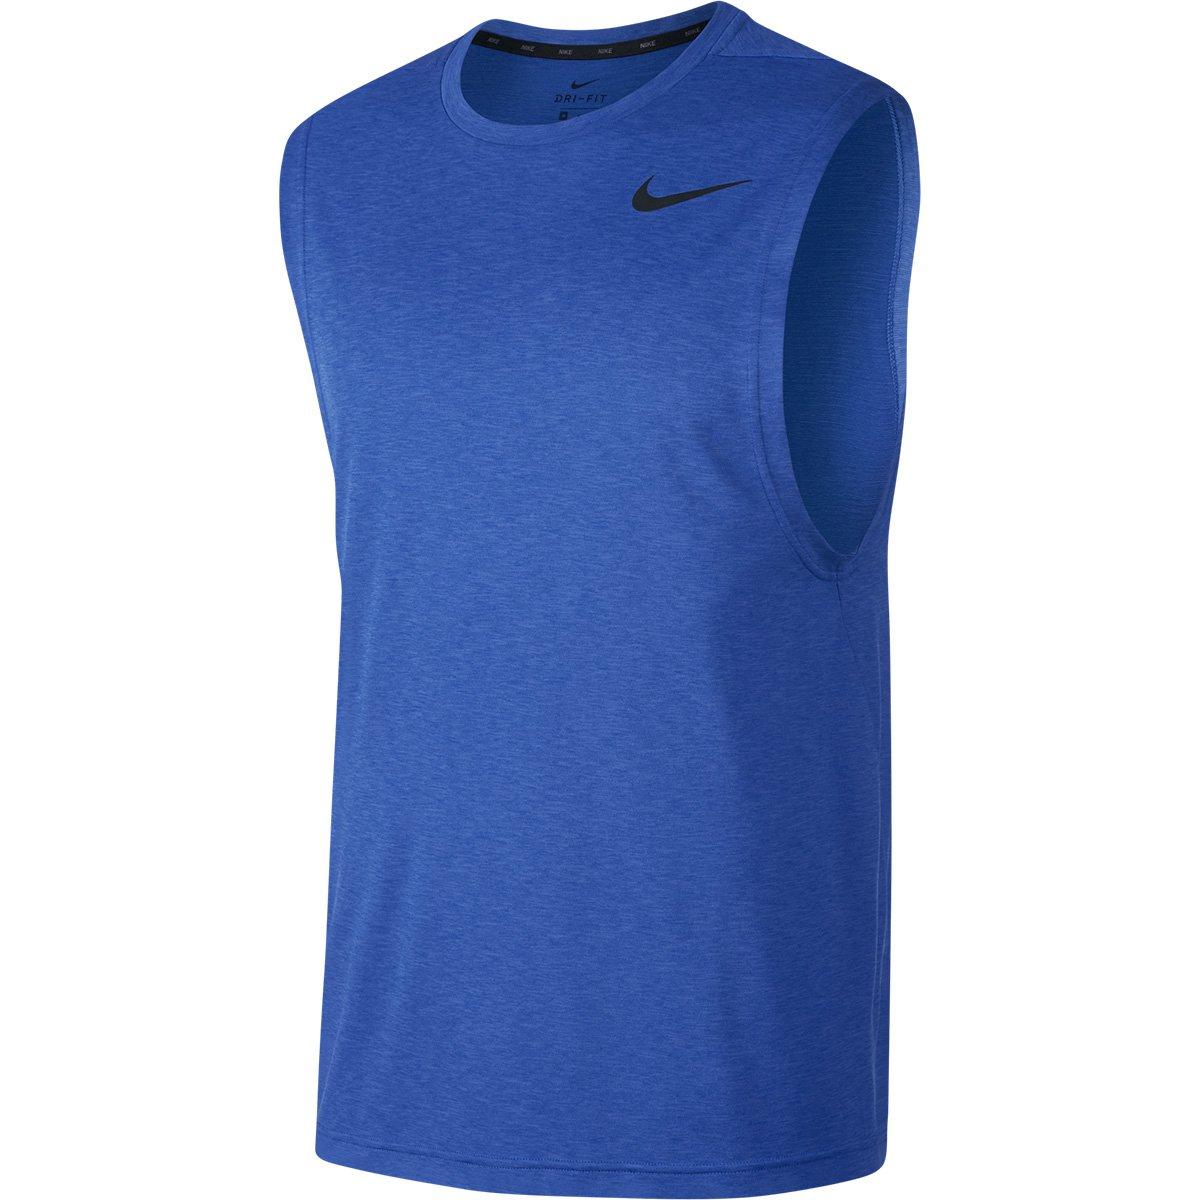 Regata Nike Breathe Tank Muscle Hyper Masculina  920de495df5